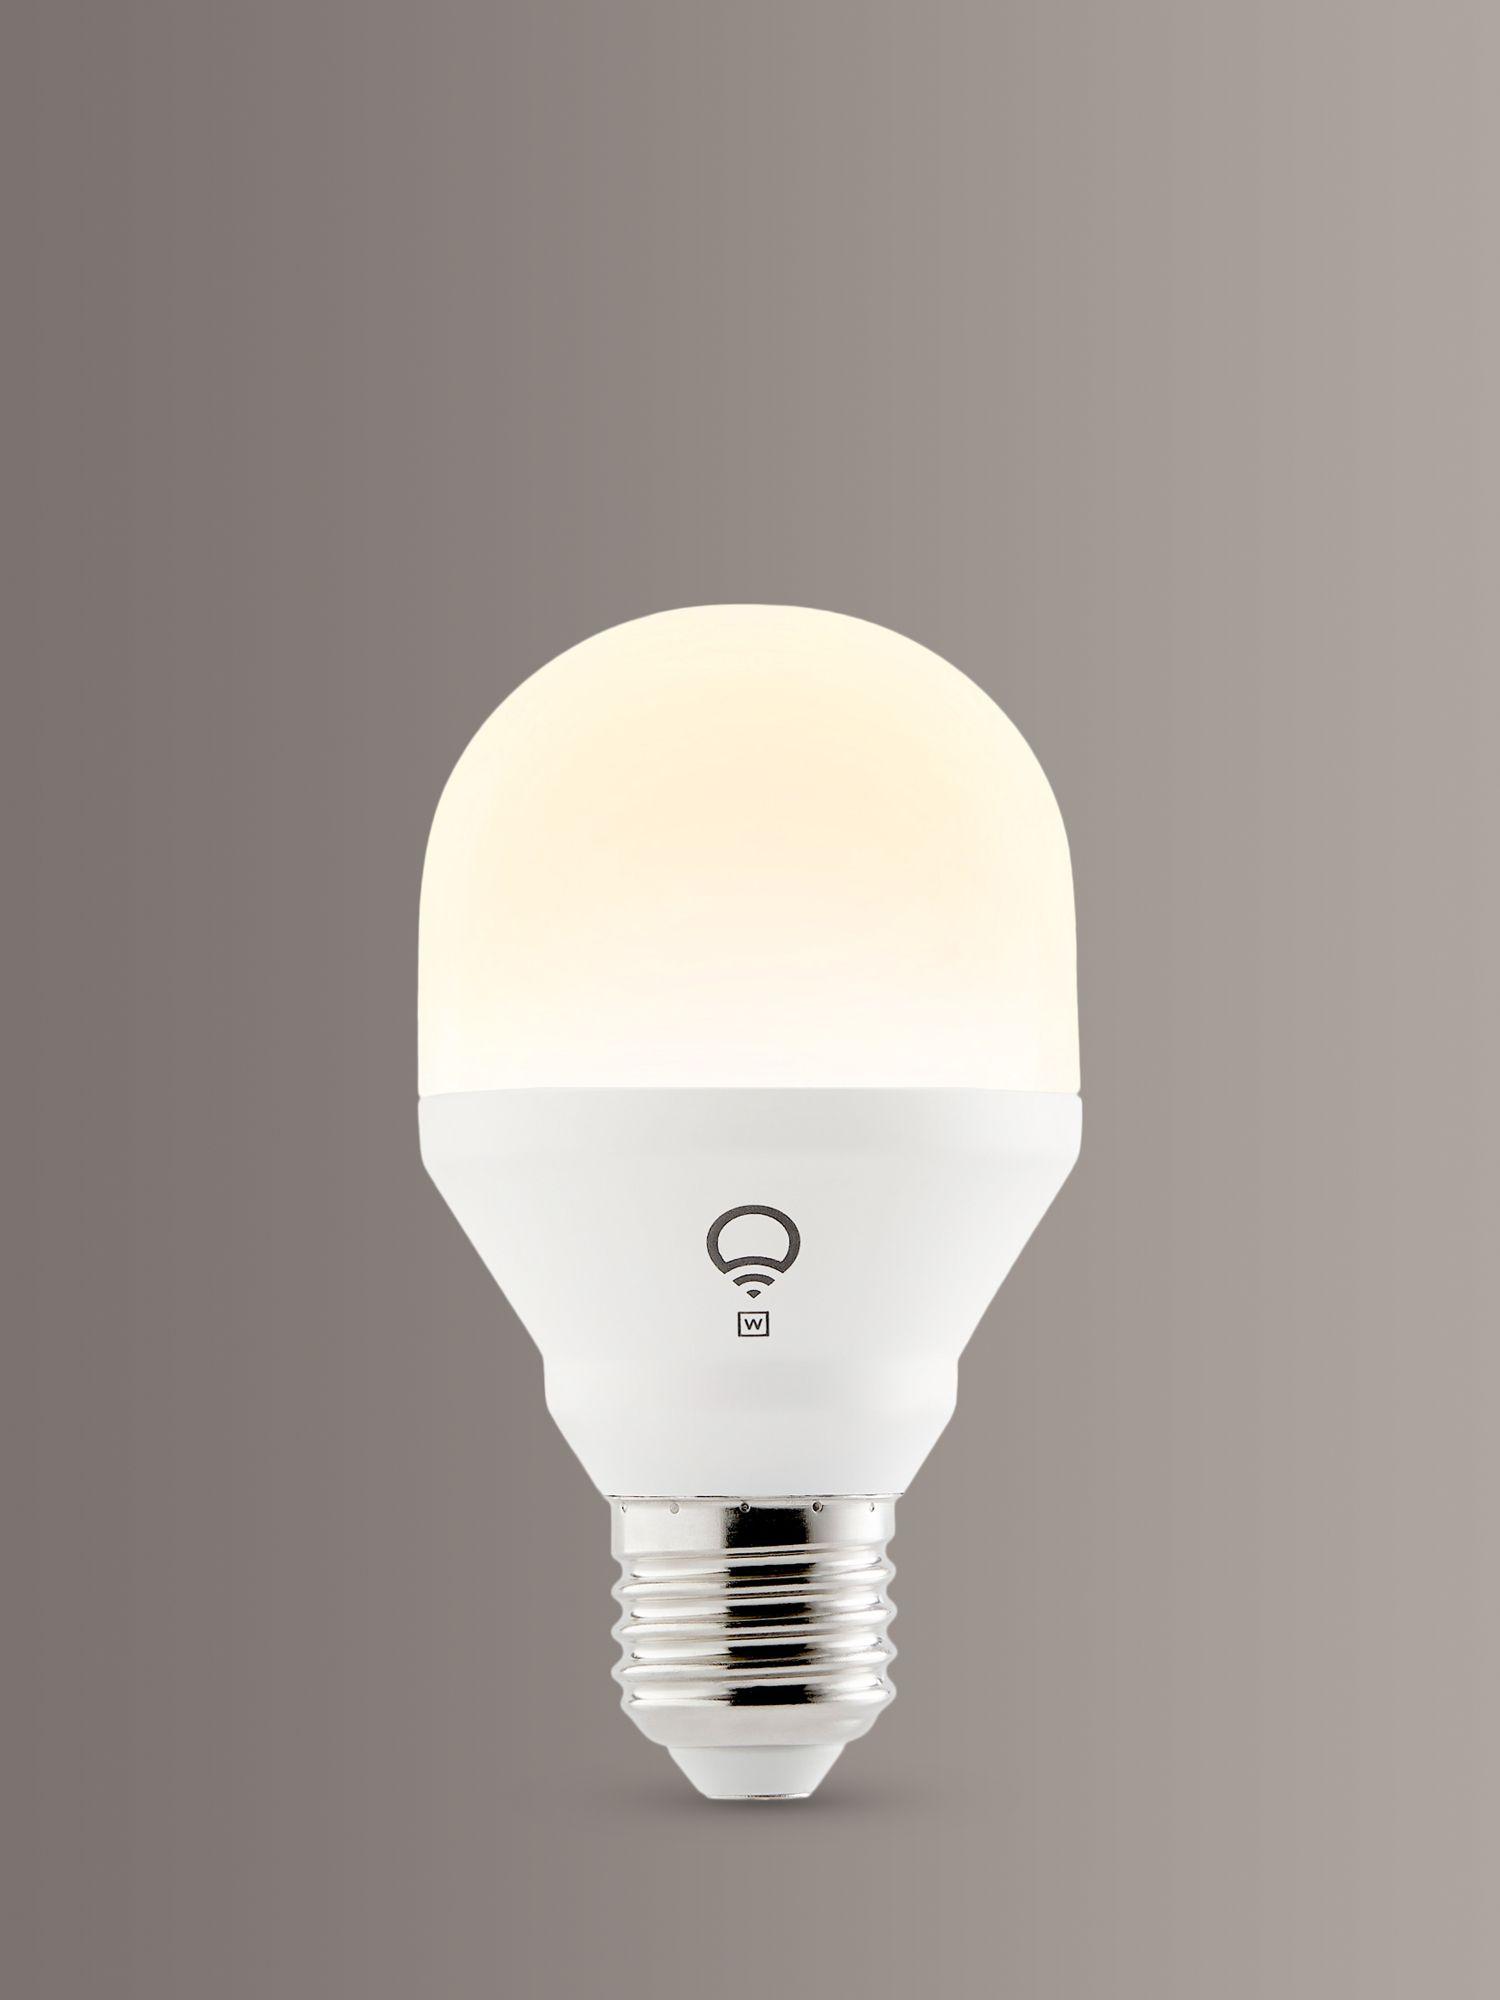 LIFX Mini White Wireless Smart Lighting LED Light Bulb, 9W A60 E27 Edison Screw Bulb, Single